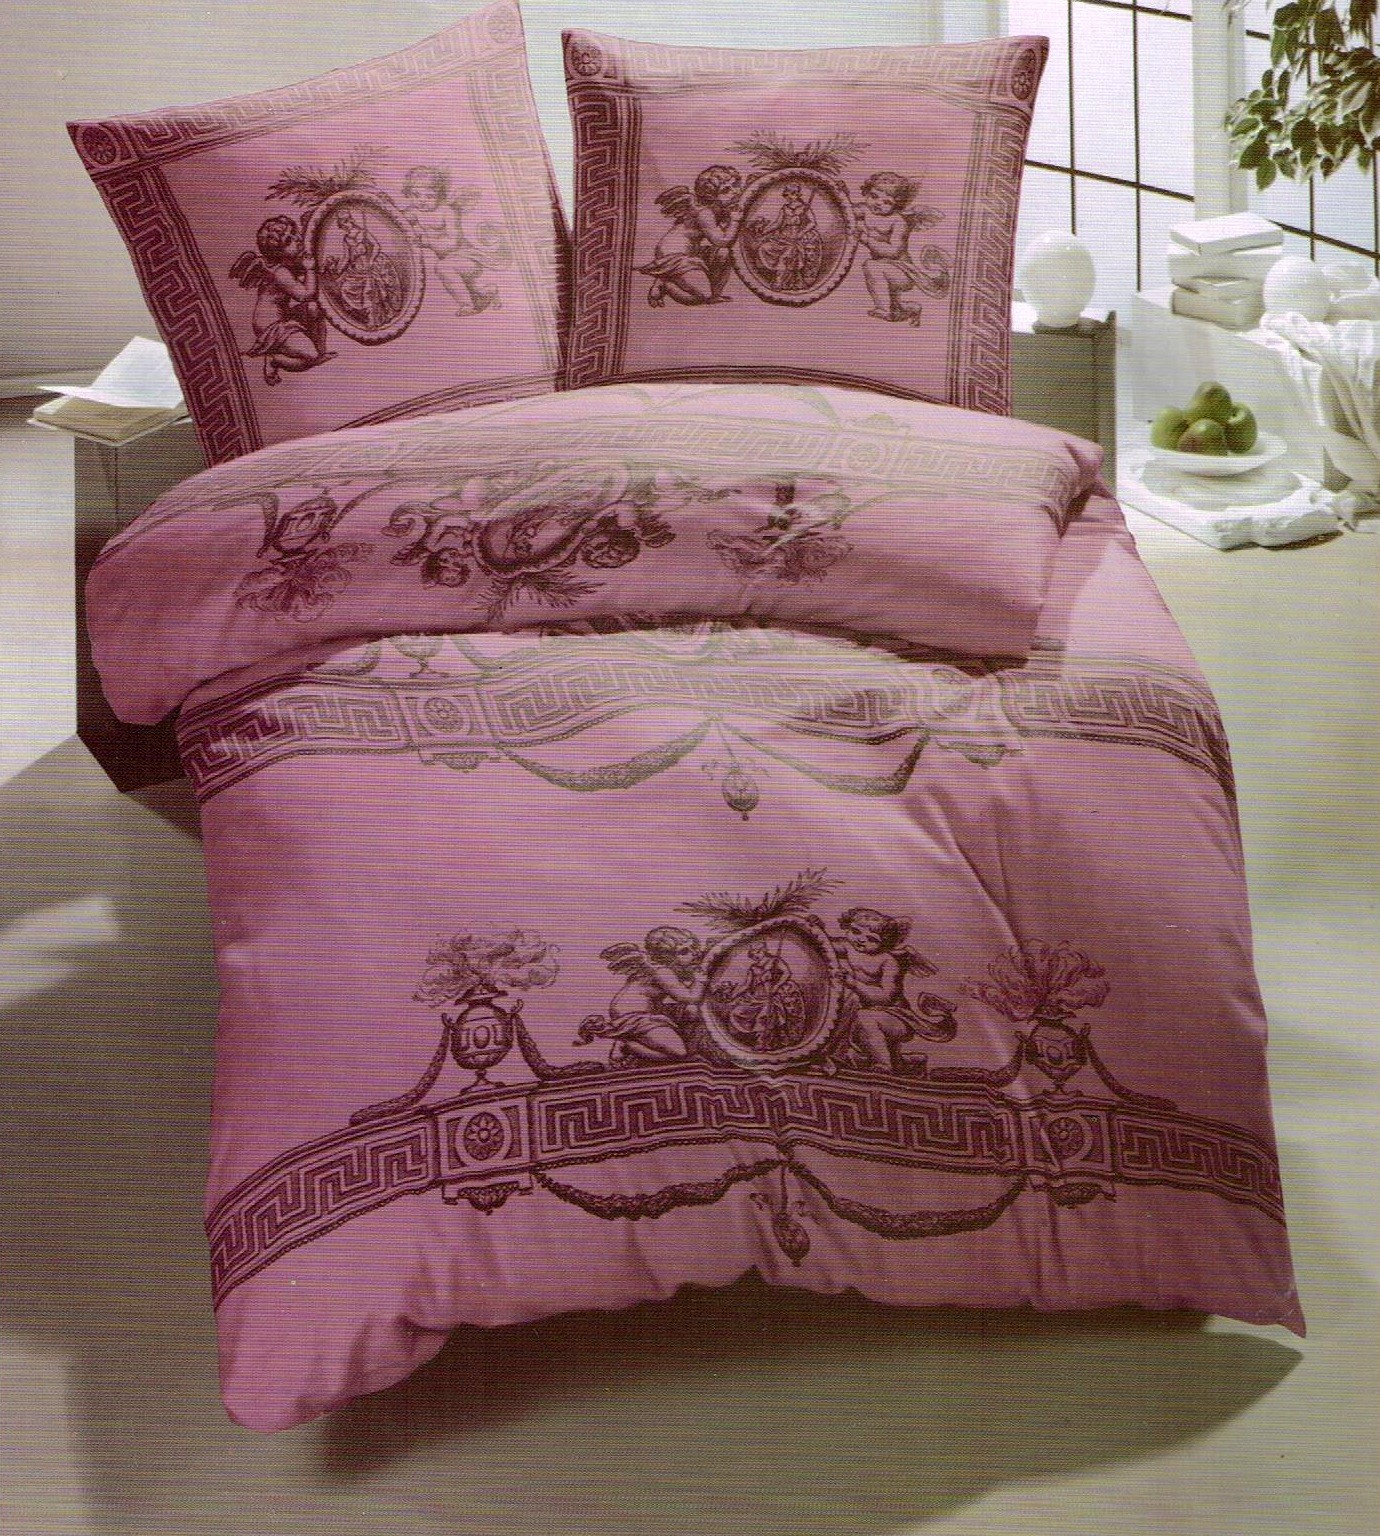 hochwertige bettw sche 2 tlg set 2 x kissenbezug purpur barock engel ebay. Black Bedroom Furniture Sets. Home Design Ideas